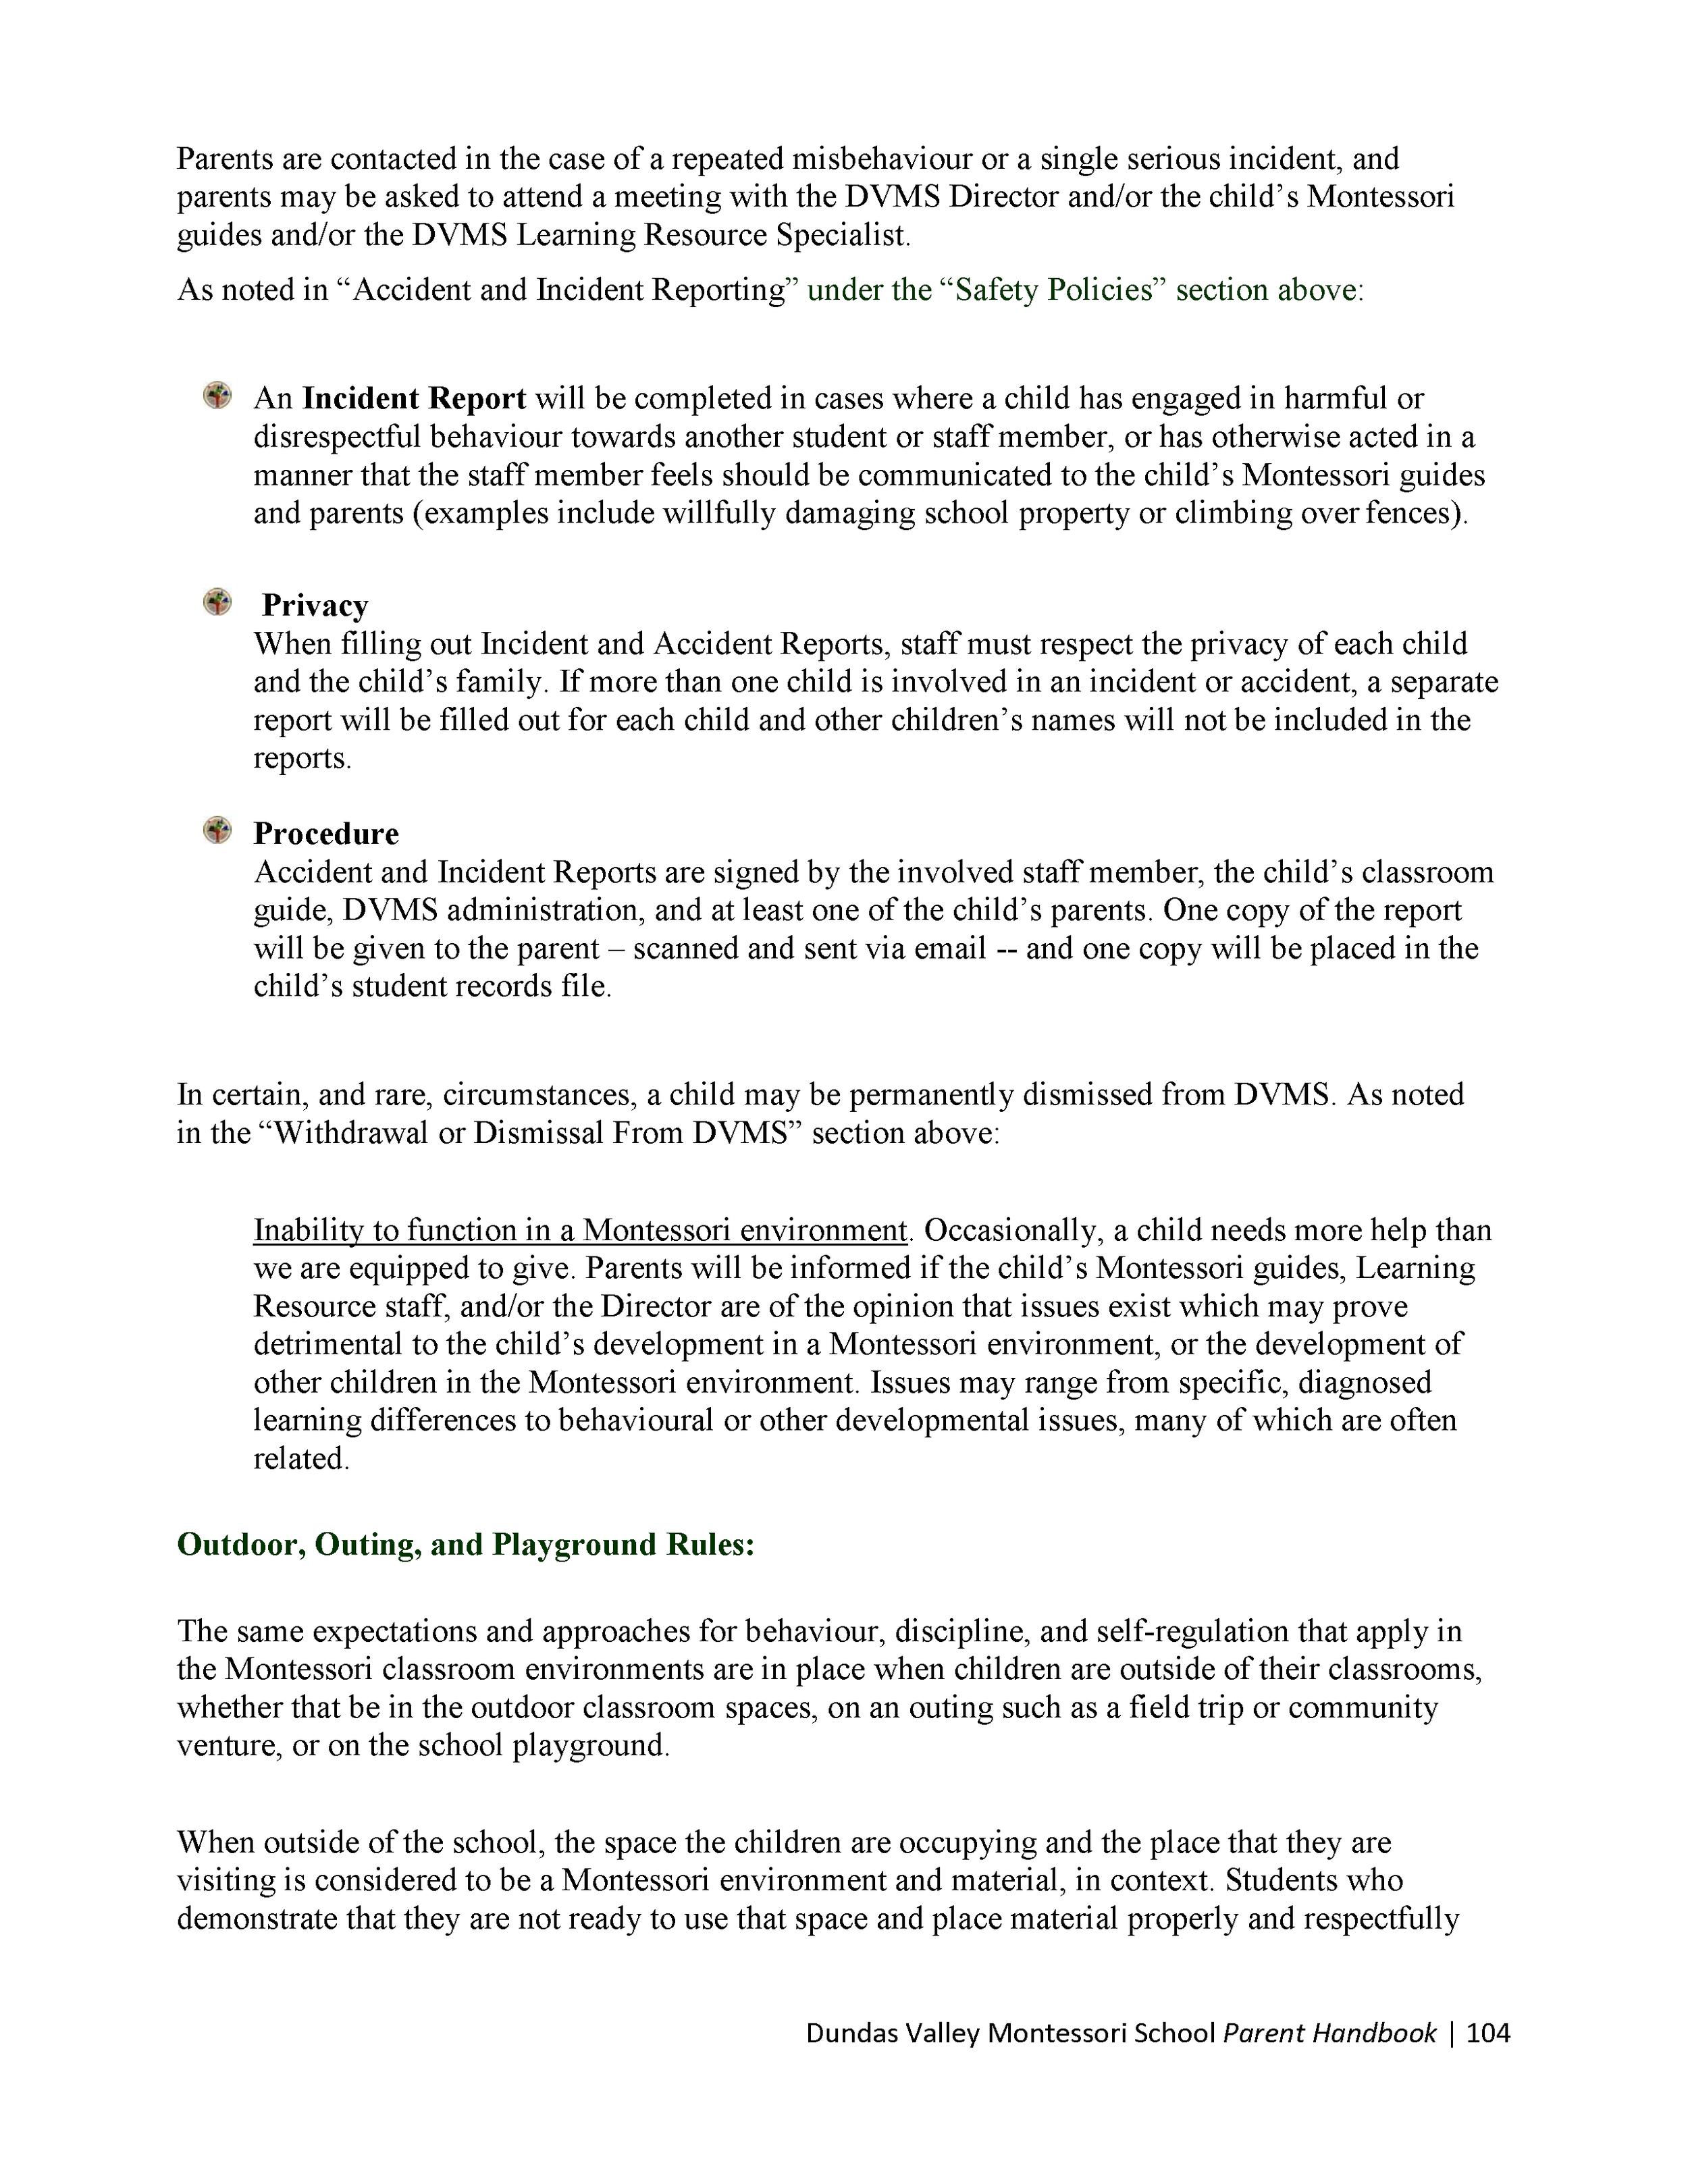 DVMS-Parent-Handbook-19-20_Page_106.png